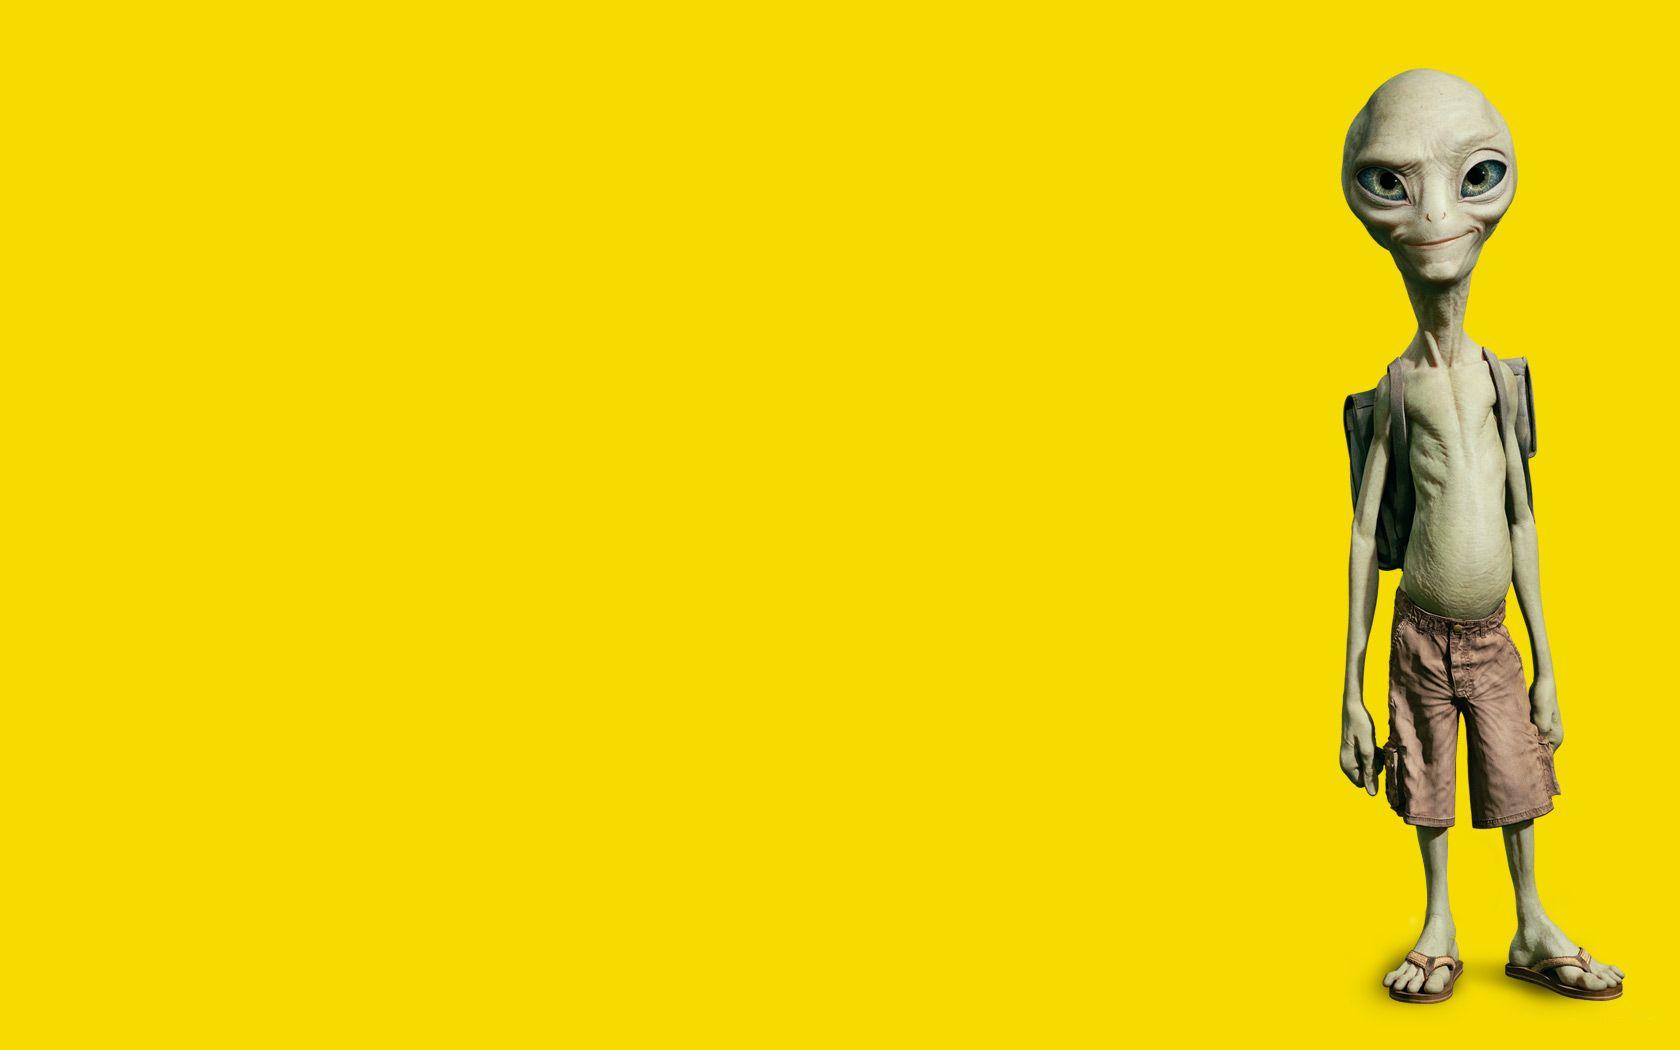 Movies yellow Paul Movie wallpaper 1680x1050 223227 1680x1050